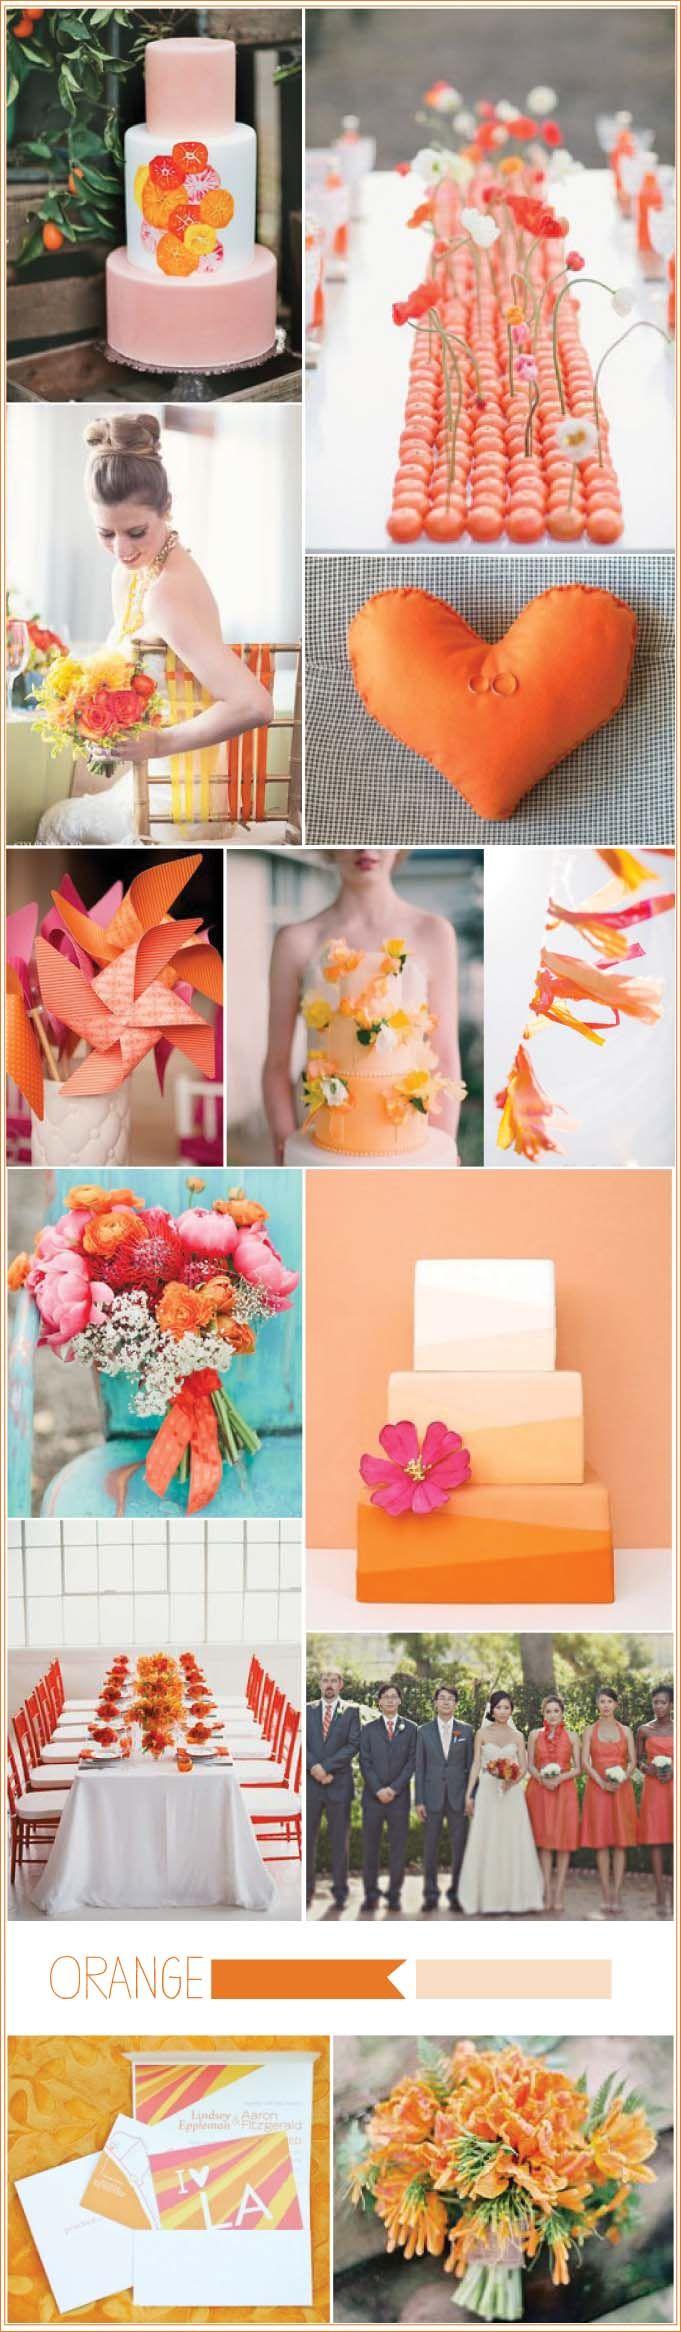 Tangerine and Orange Wedding Inspiration